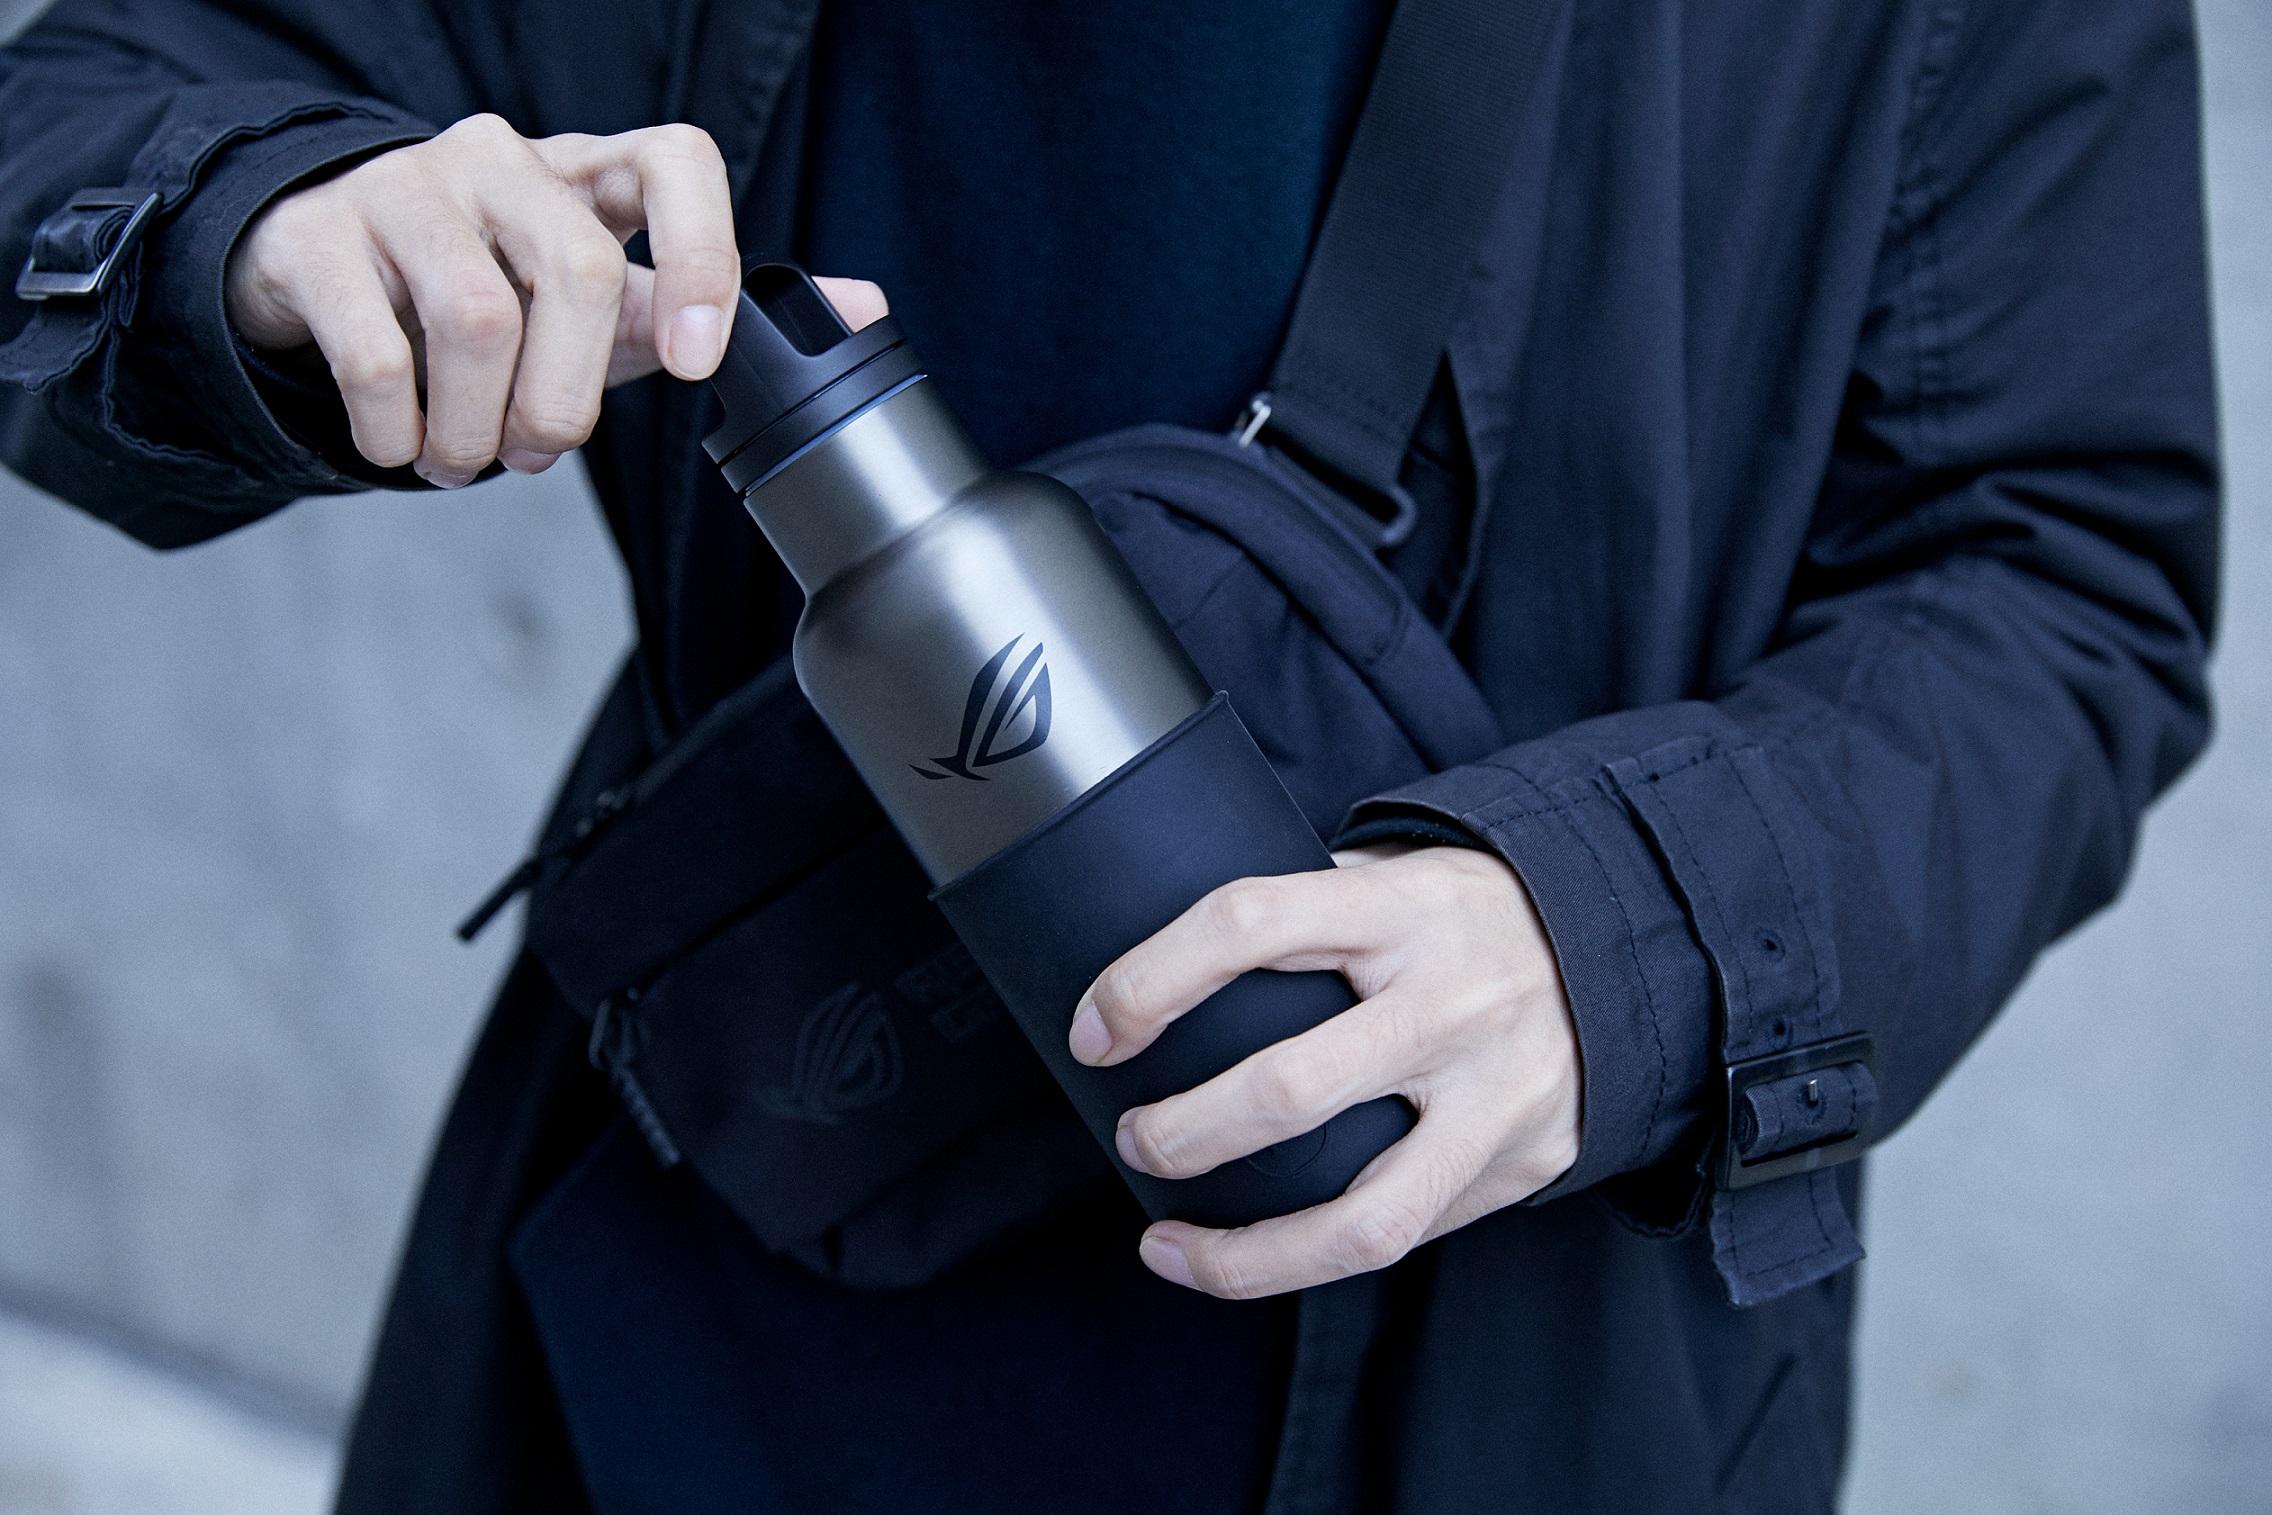 ROG x HYDY不鏽鋼保溫水瓶真空保溫效果最高可達12小時、保冷24小時,讓玩家們可隨時隨地展現ROG潮電競風格。